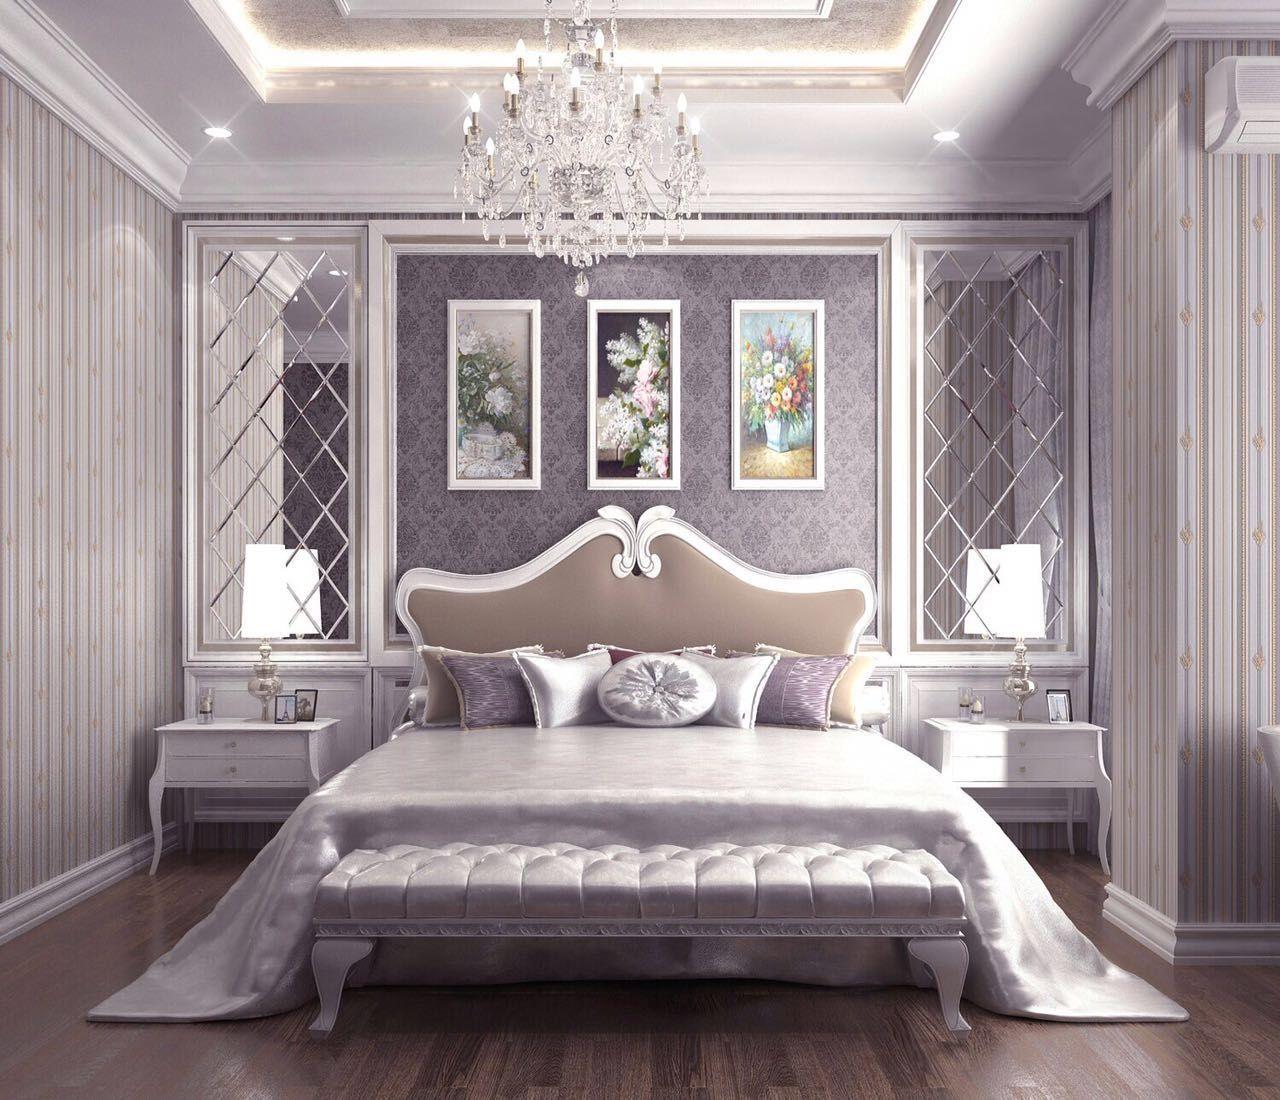 Large master bedroom decor ideas  bedroom furniture decor decoration design designfurniture